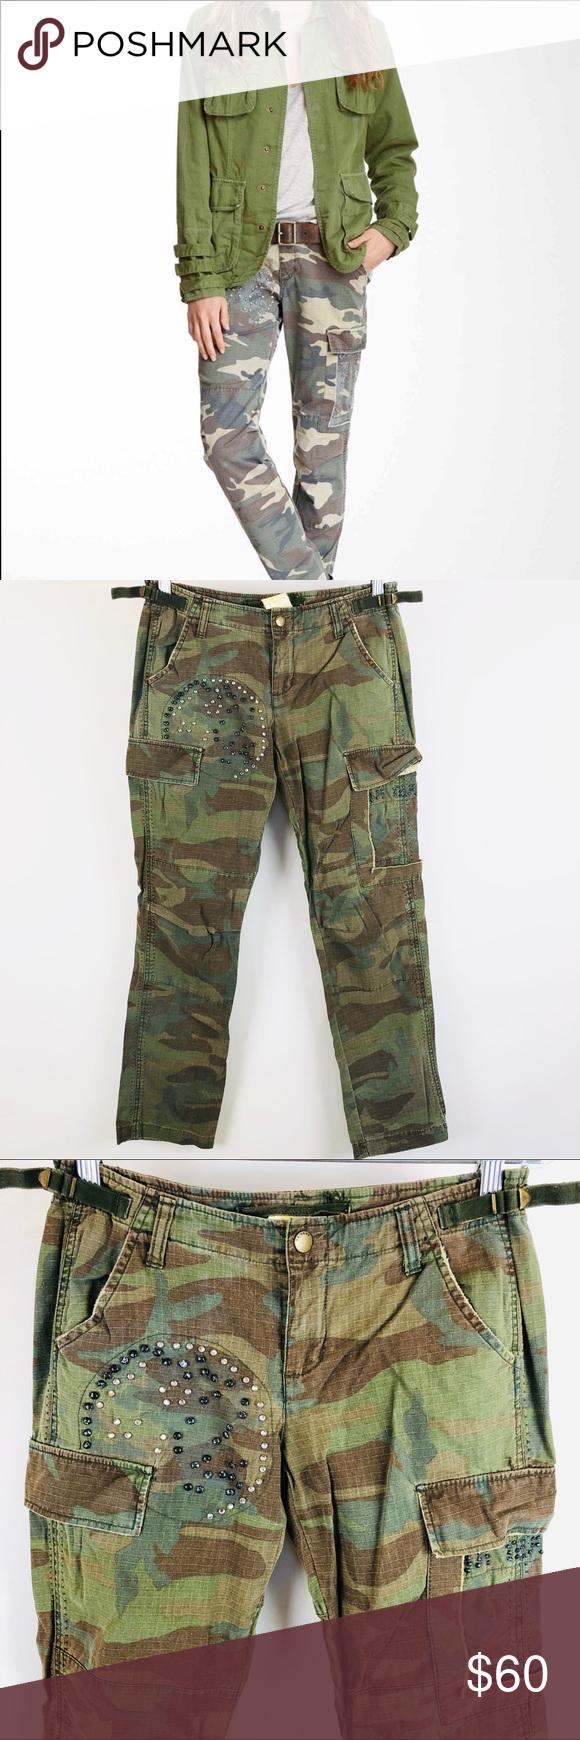 Da Nang Camo Cargo Pants Camo Cargo Pants Cargo Pants Pants